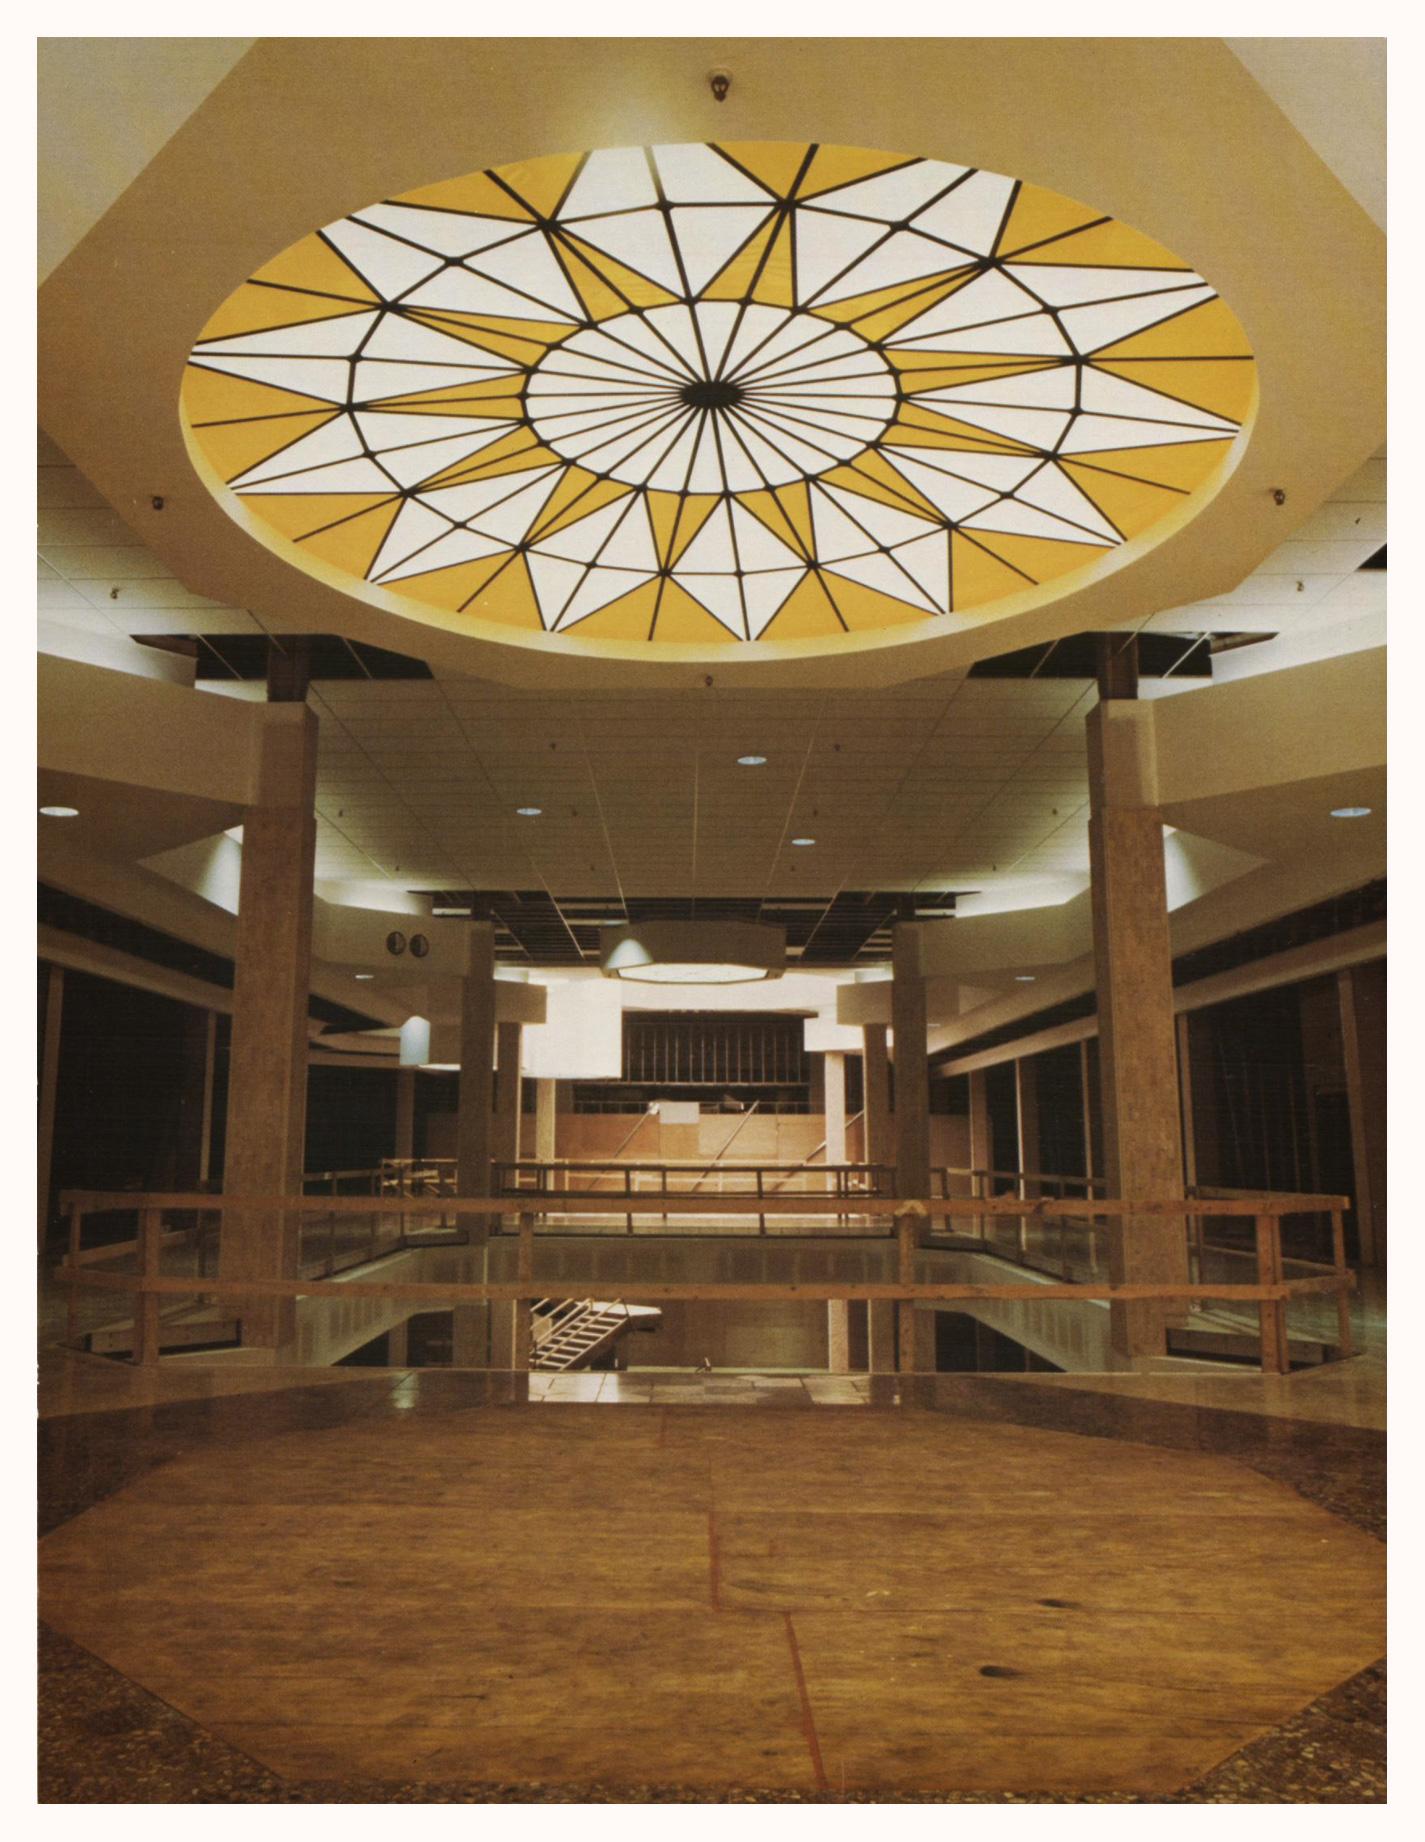 Higbee's Randall Park Mall Under Construction